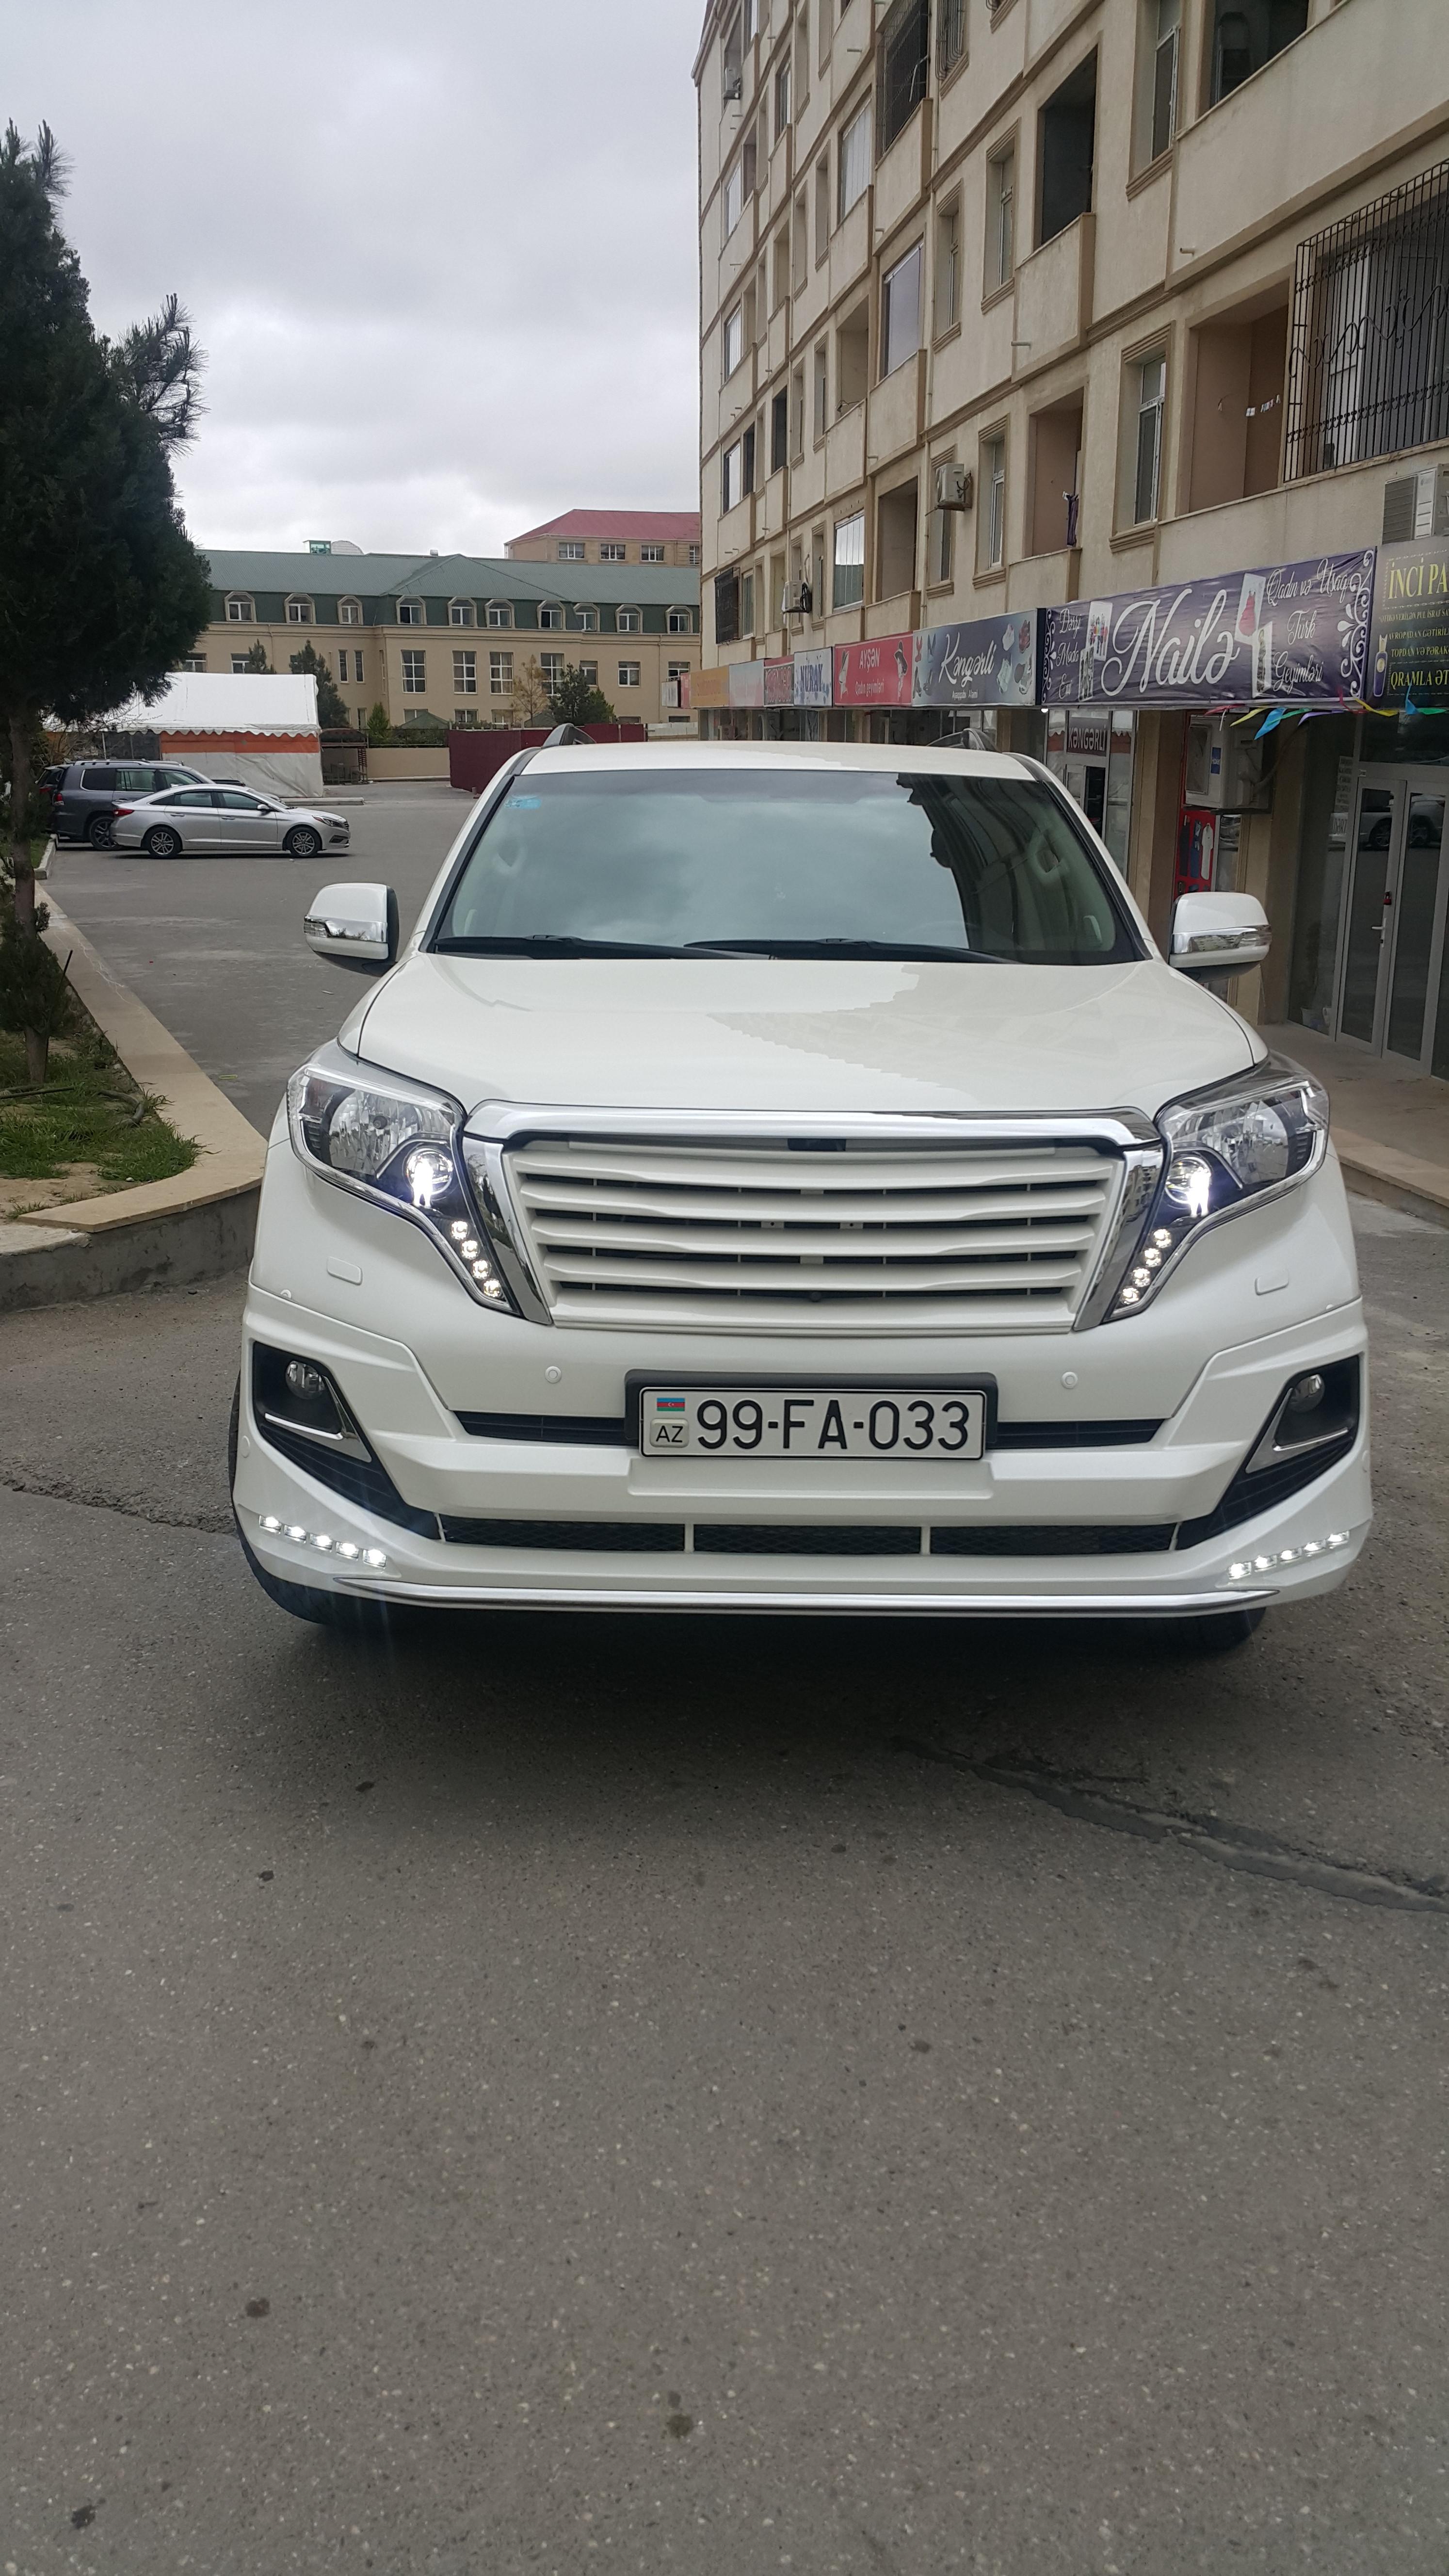 Toyota Prado 2.7(lt) 2014 İkinci əl  $33000